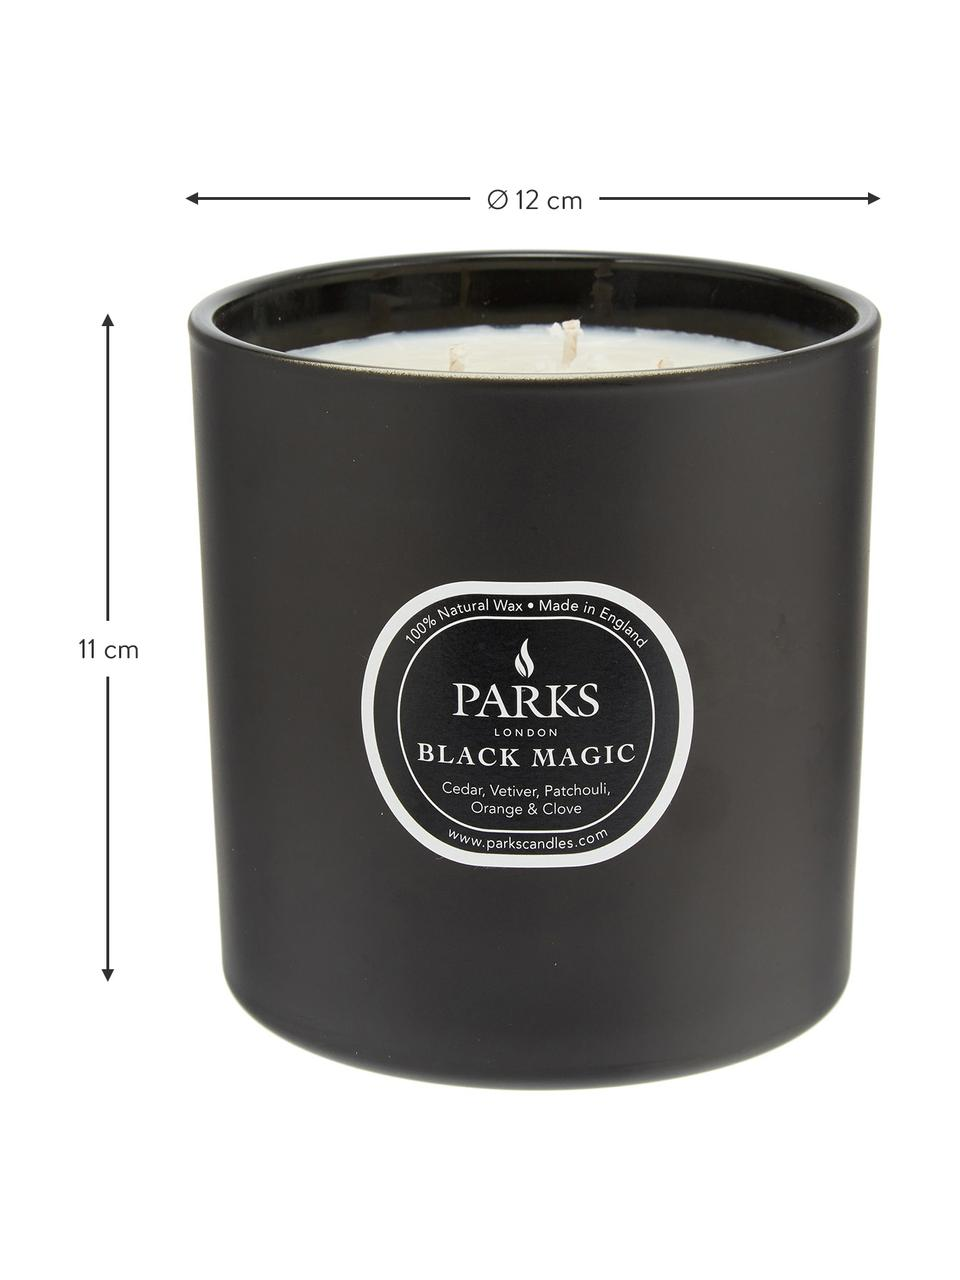 Dreidochtduftkerze Black Magic (Zedernholz, Vetivergras & Patschuli), Behälter: Glas, Zedernholz, Vetivergras & Patschuli, Ø 12 x H 11 cm